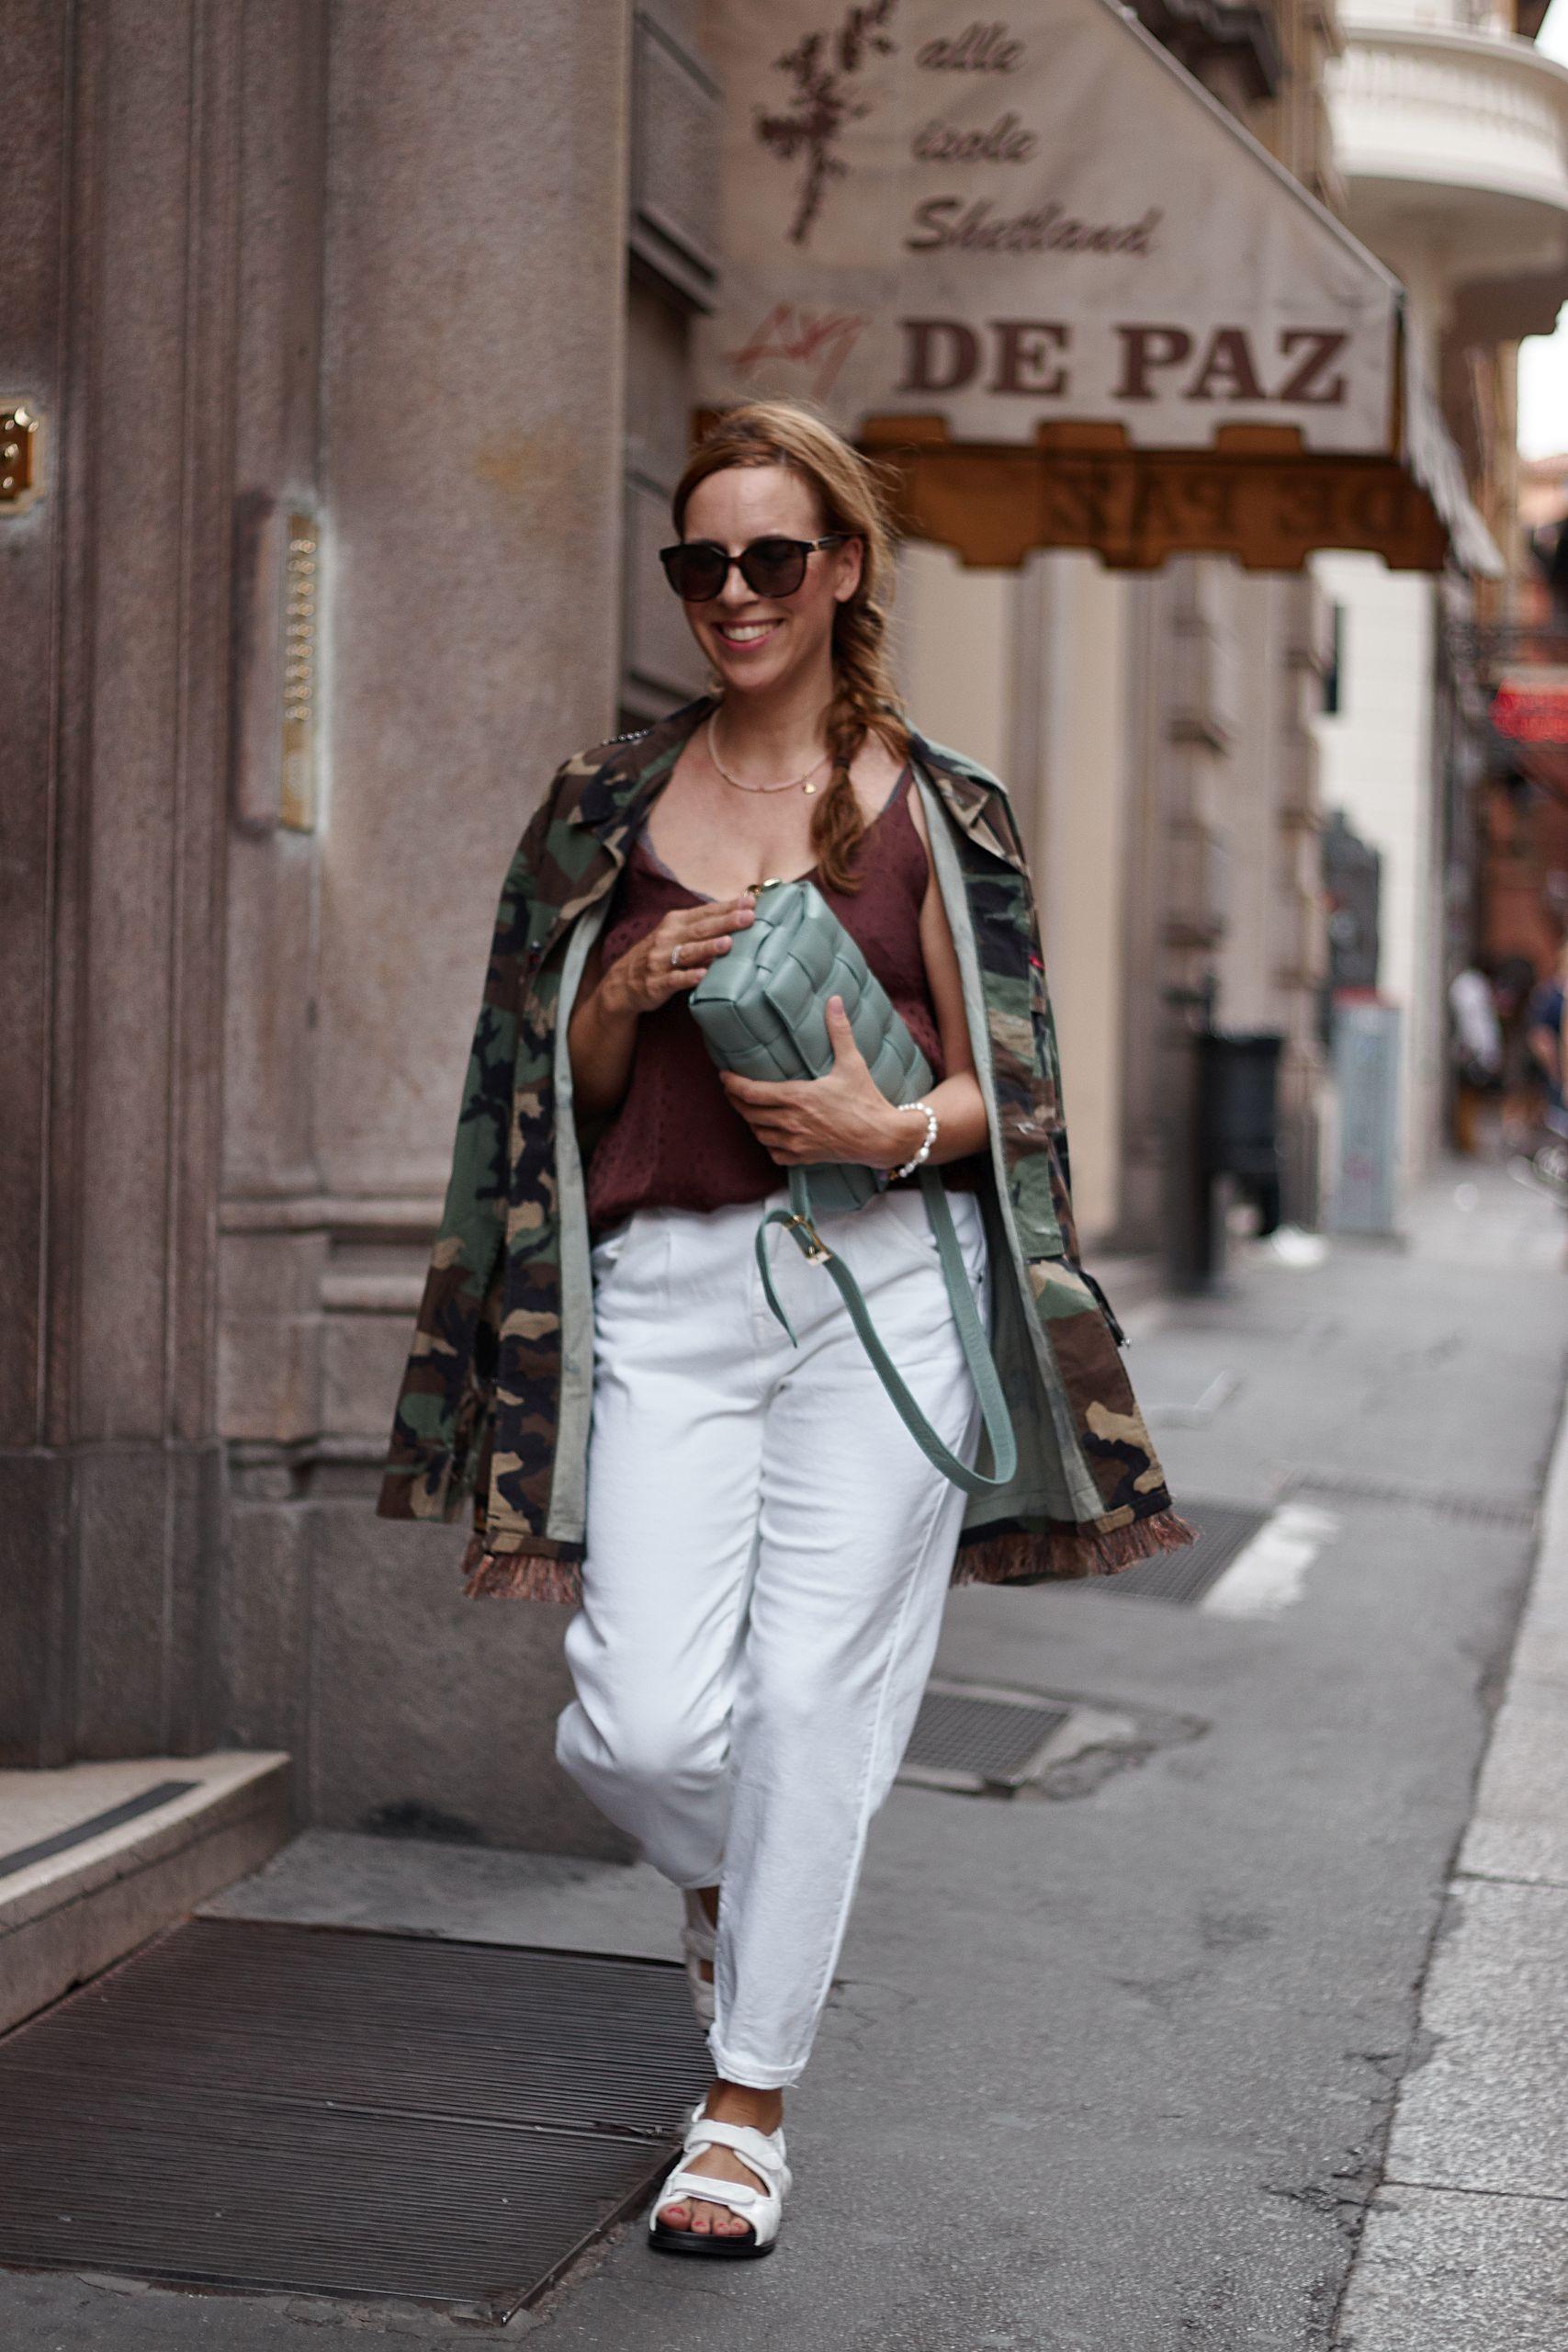 Settimo Cielo Bologna Military Jacket zu Jeans und Tracking Sandalen